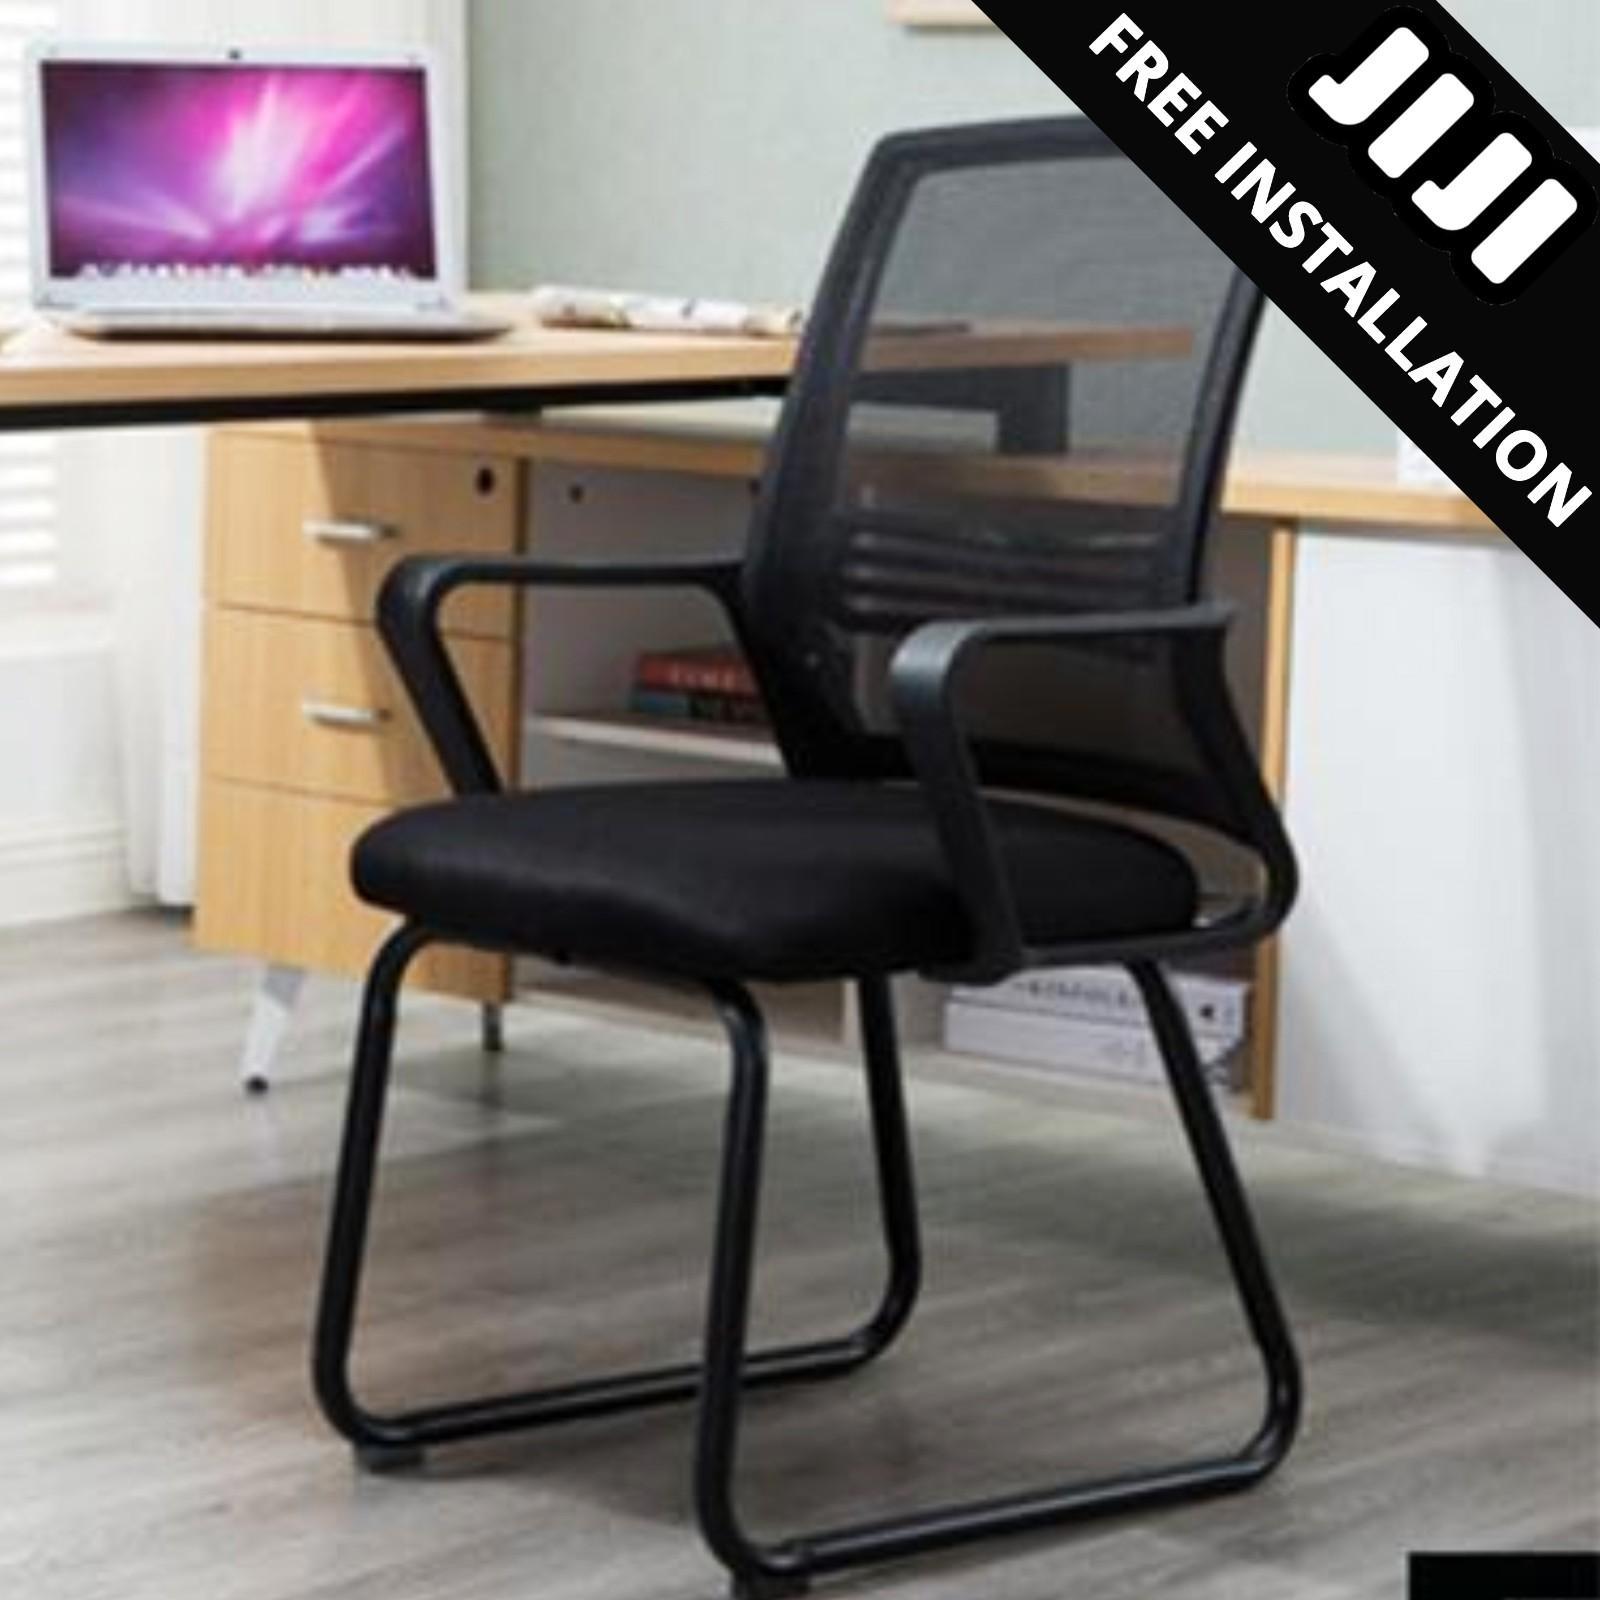 Jiji Clerk Chair Version 2 Office Chair (free Installation) - Office Chair/study Chair/gaming Chair/ergonomic/ Free 12 Months Warranty (sg) By Jiji.